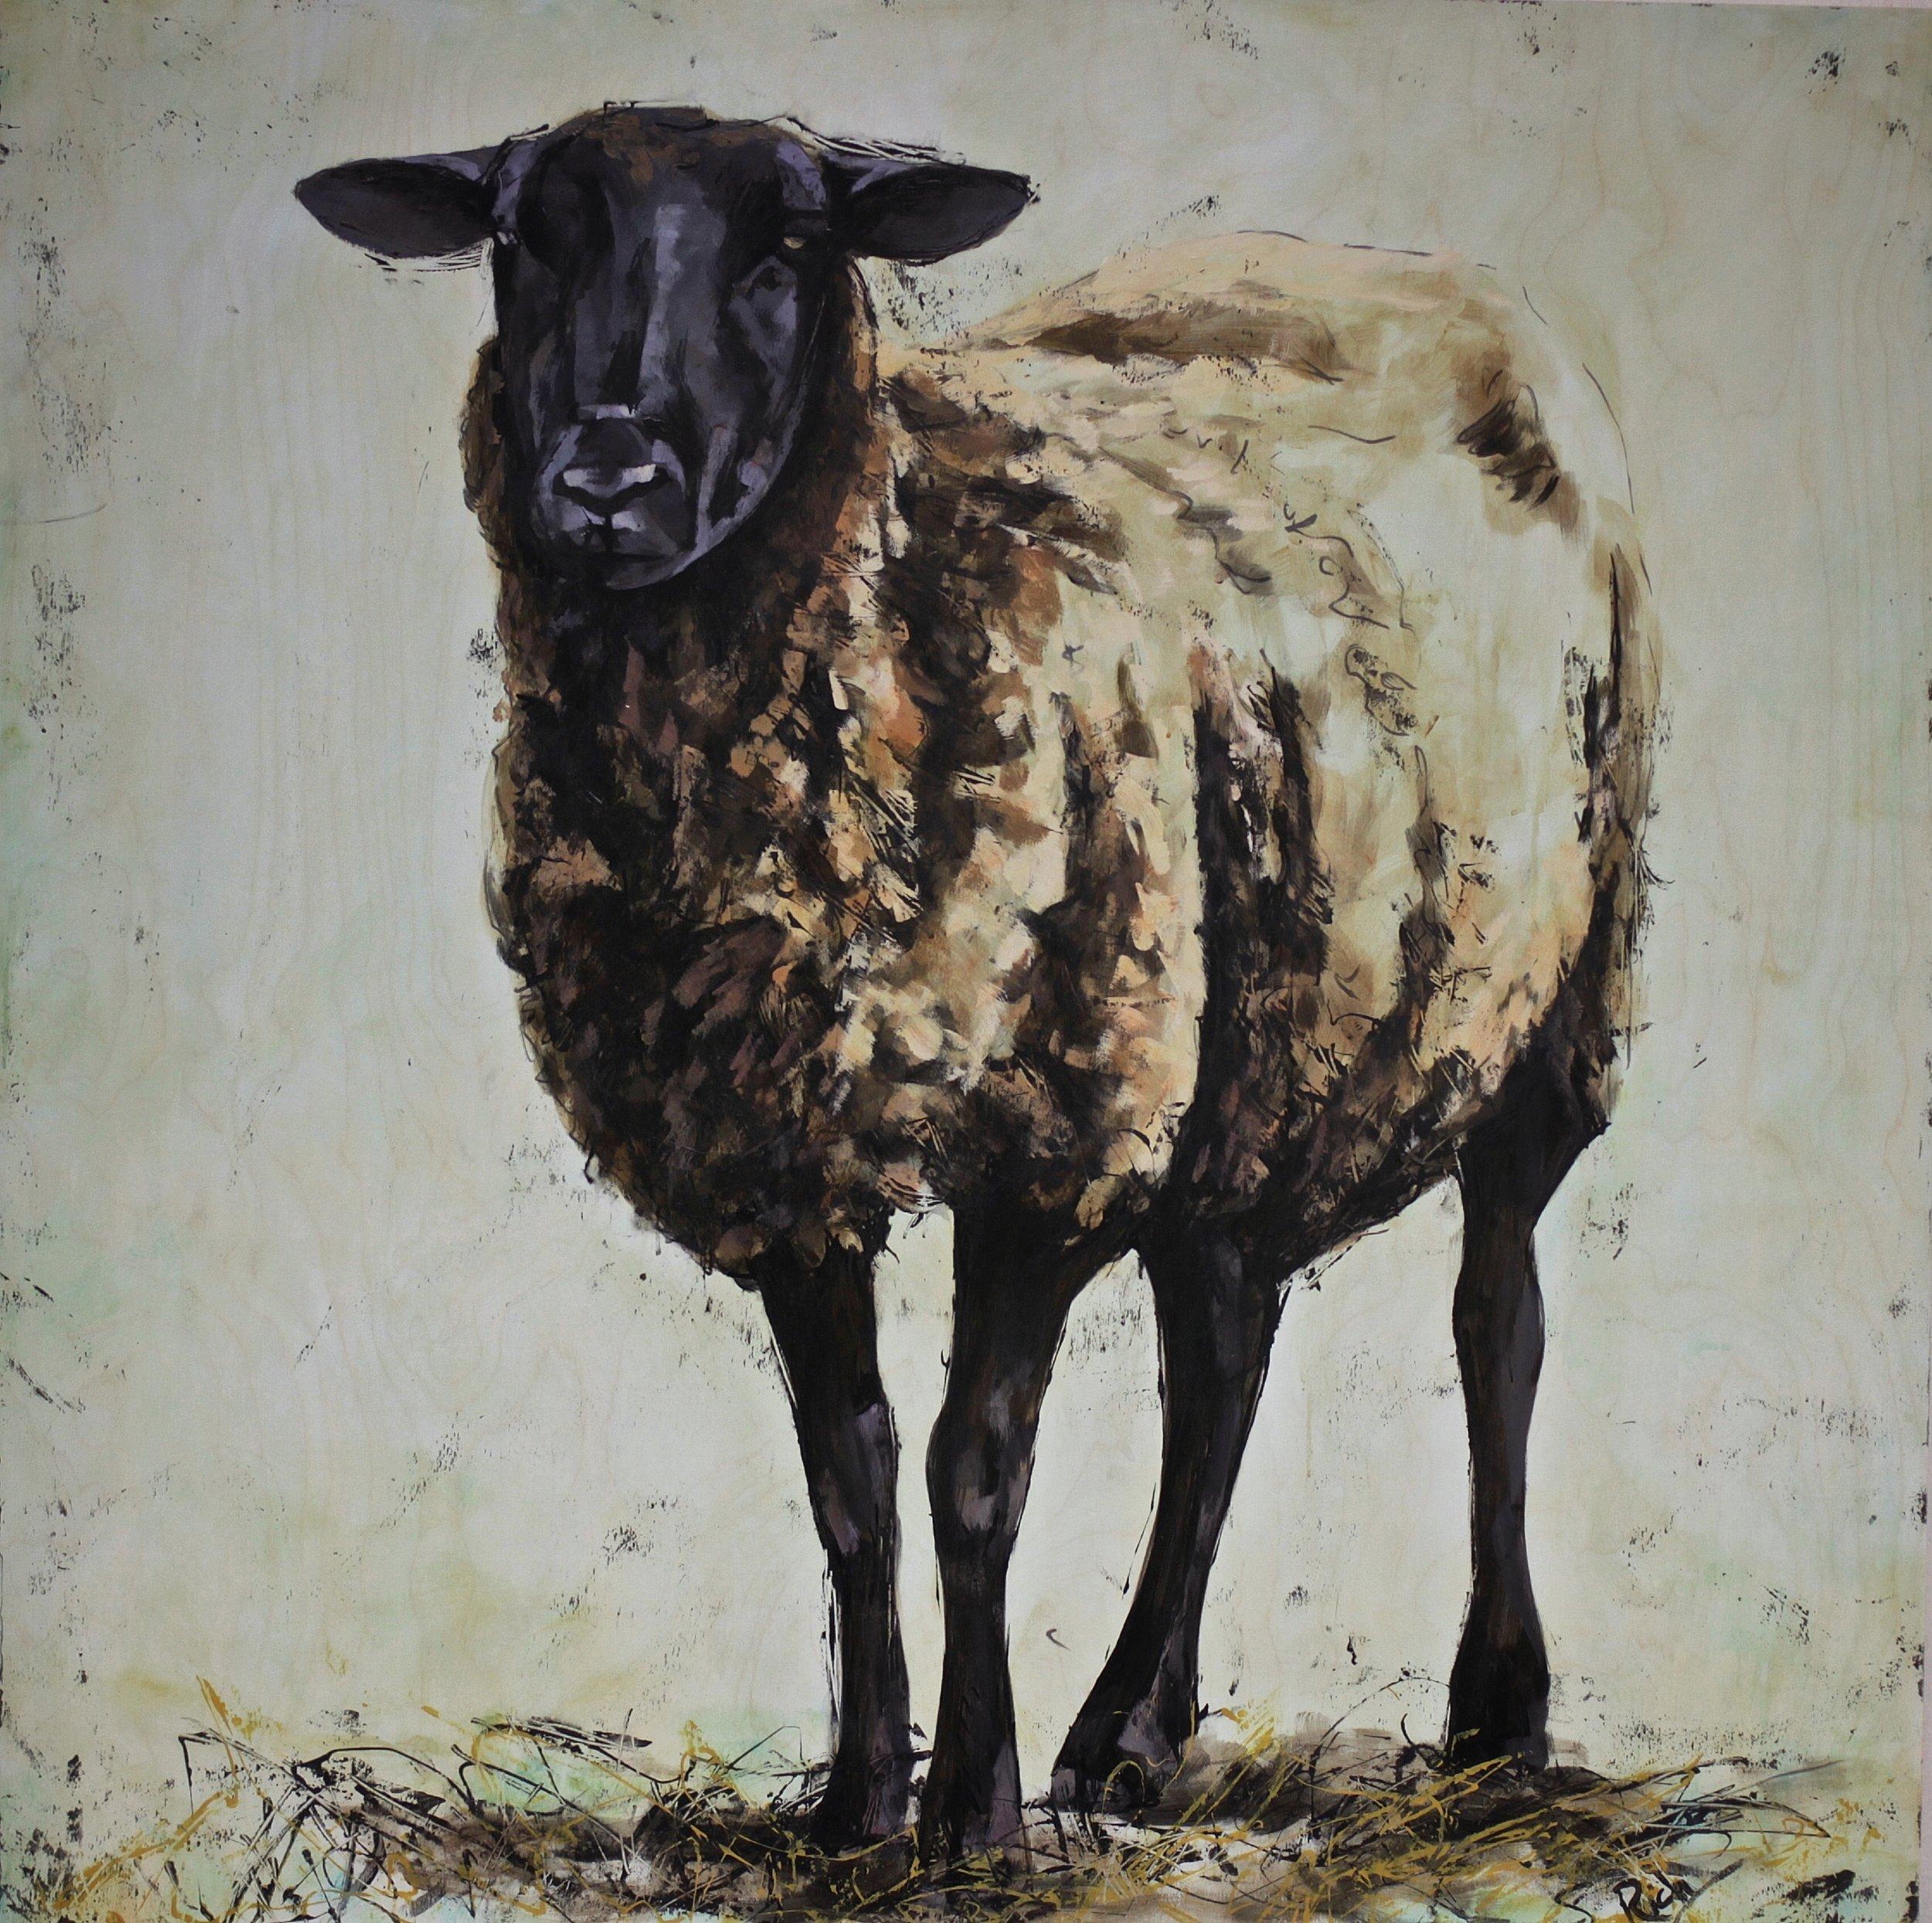 Brown Sheep  Acrylic on Birch ply 36x36